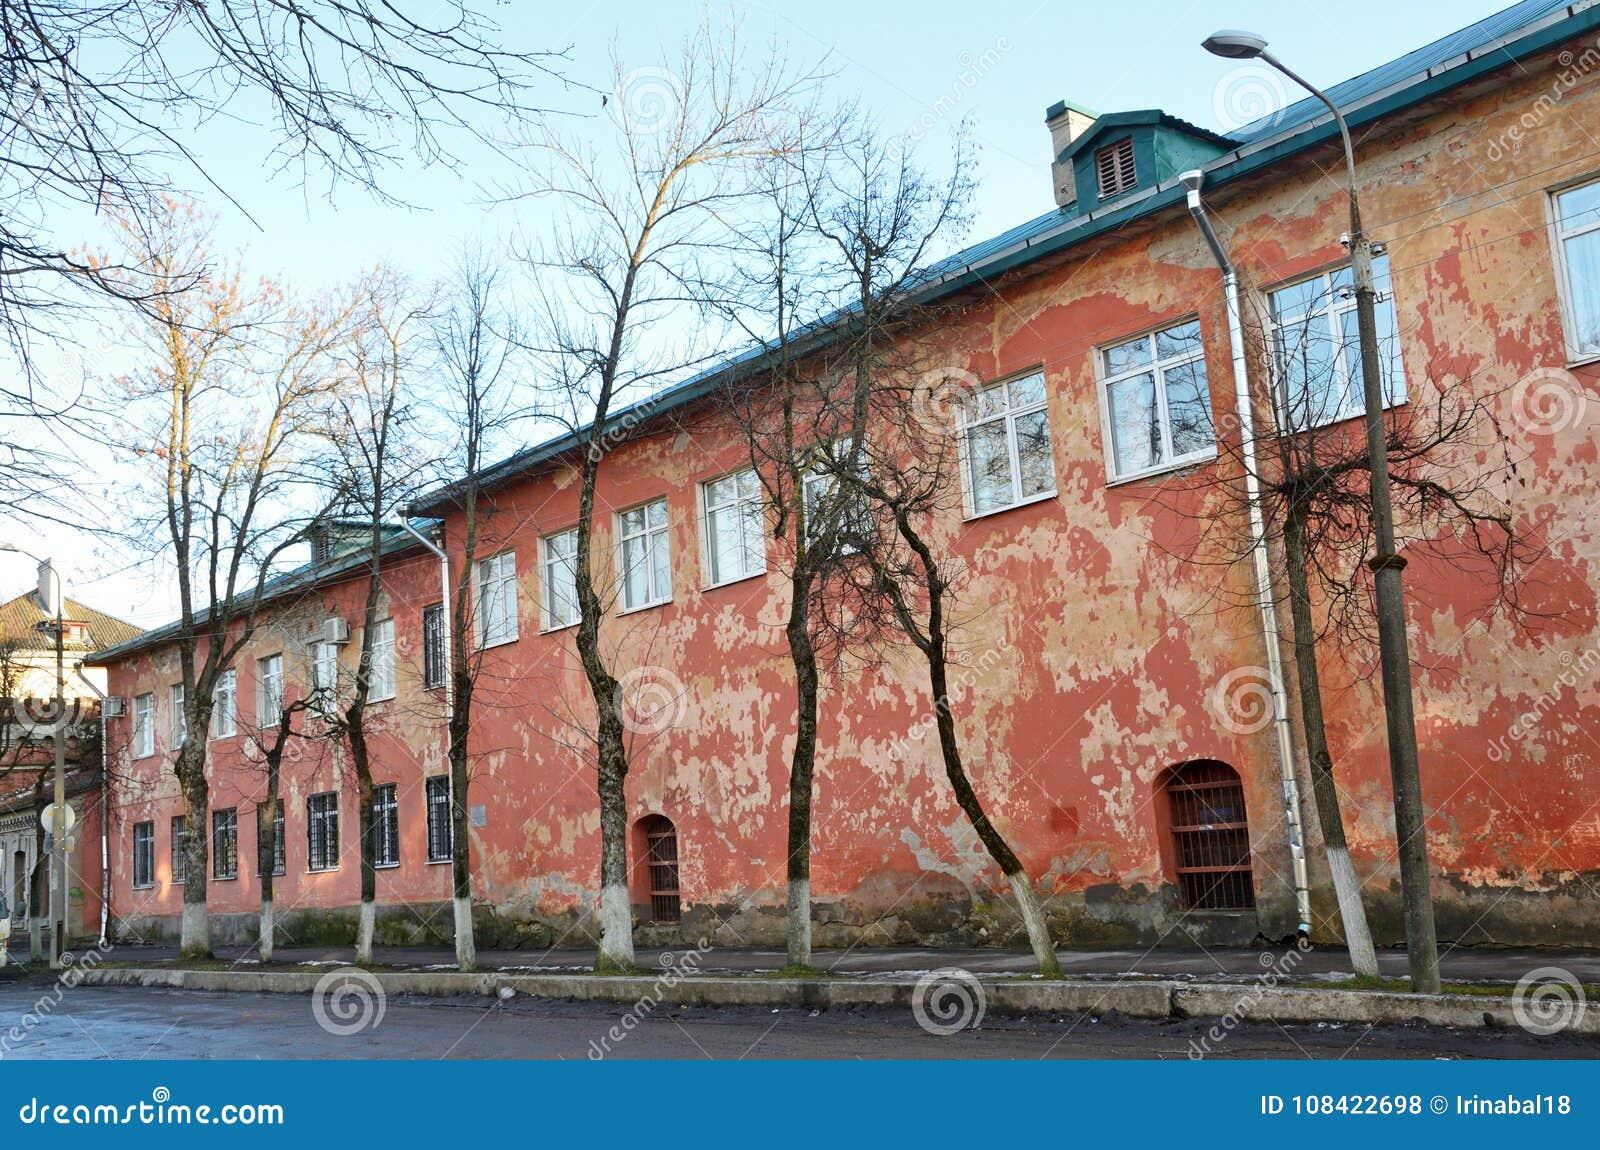 Russia, Pskov, monument of architecture - chambers of Kruzhechny yard on Sennaya niva Kerosene warehouse 1686 year built. Street